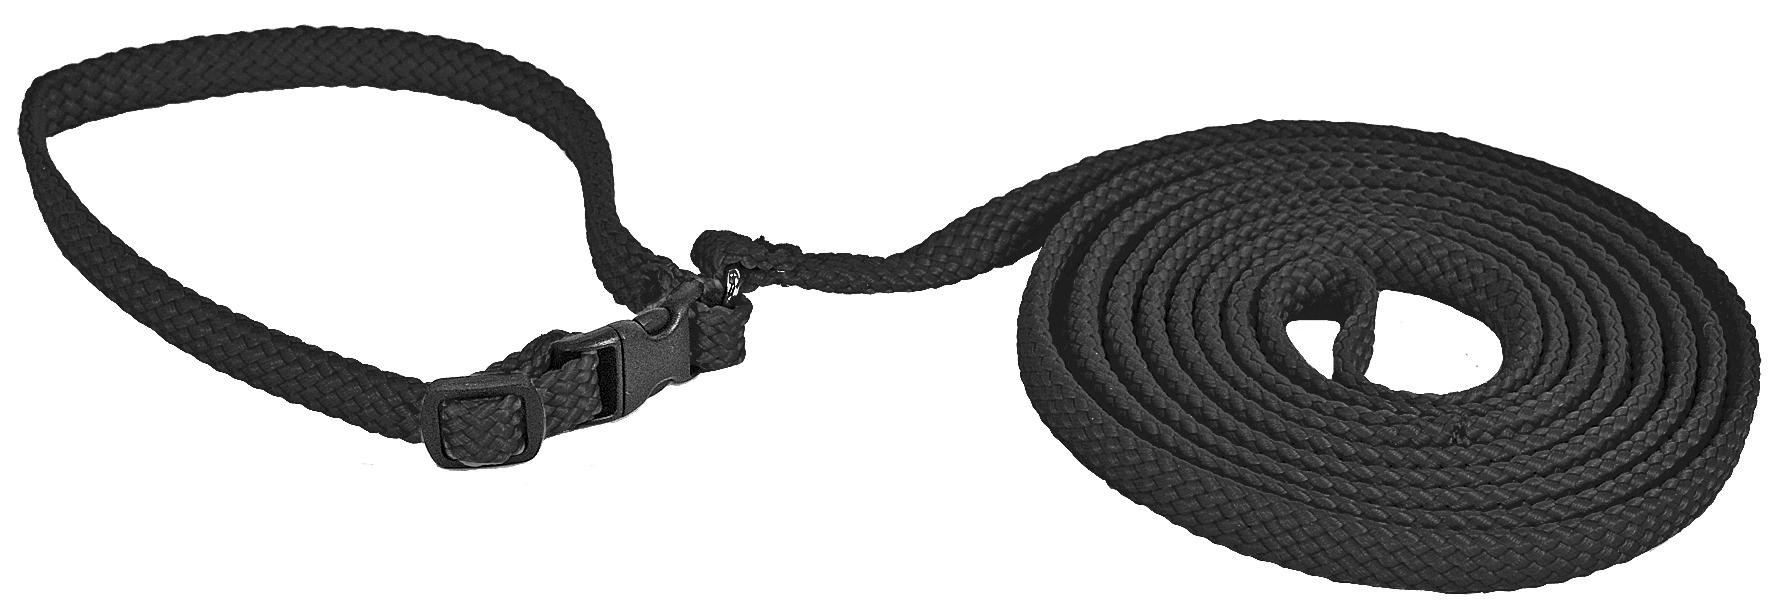 Alac Halsband+Koppel S 170cm